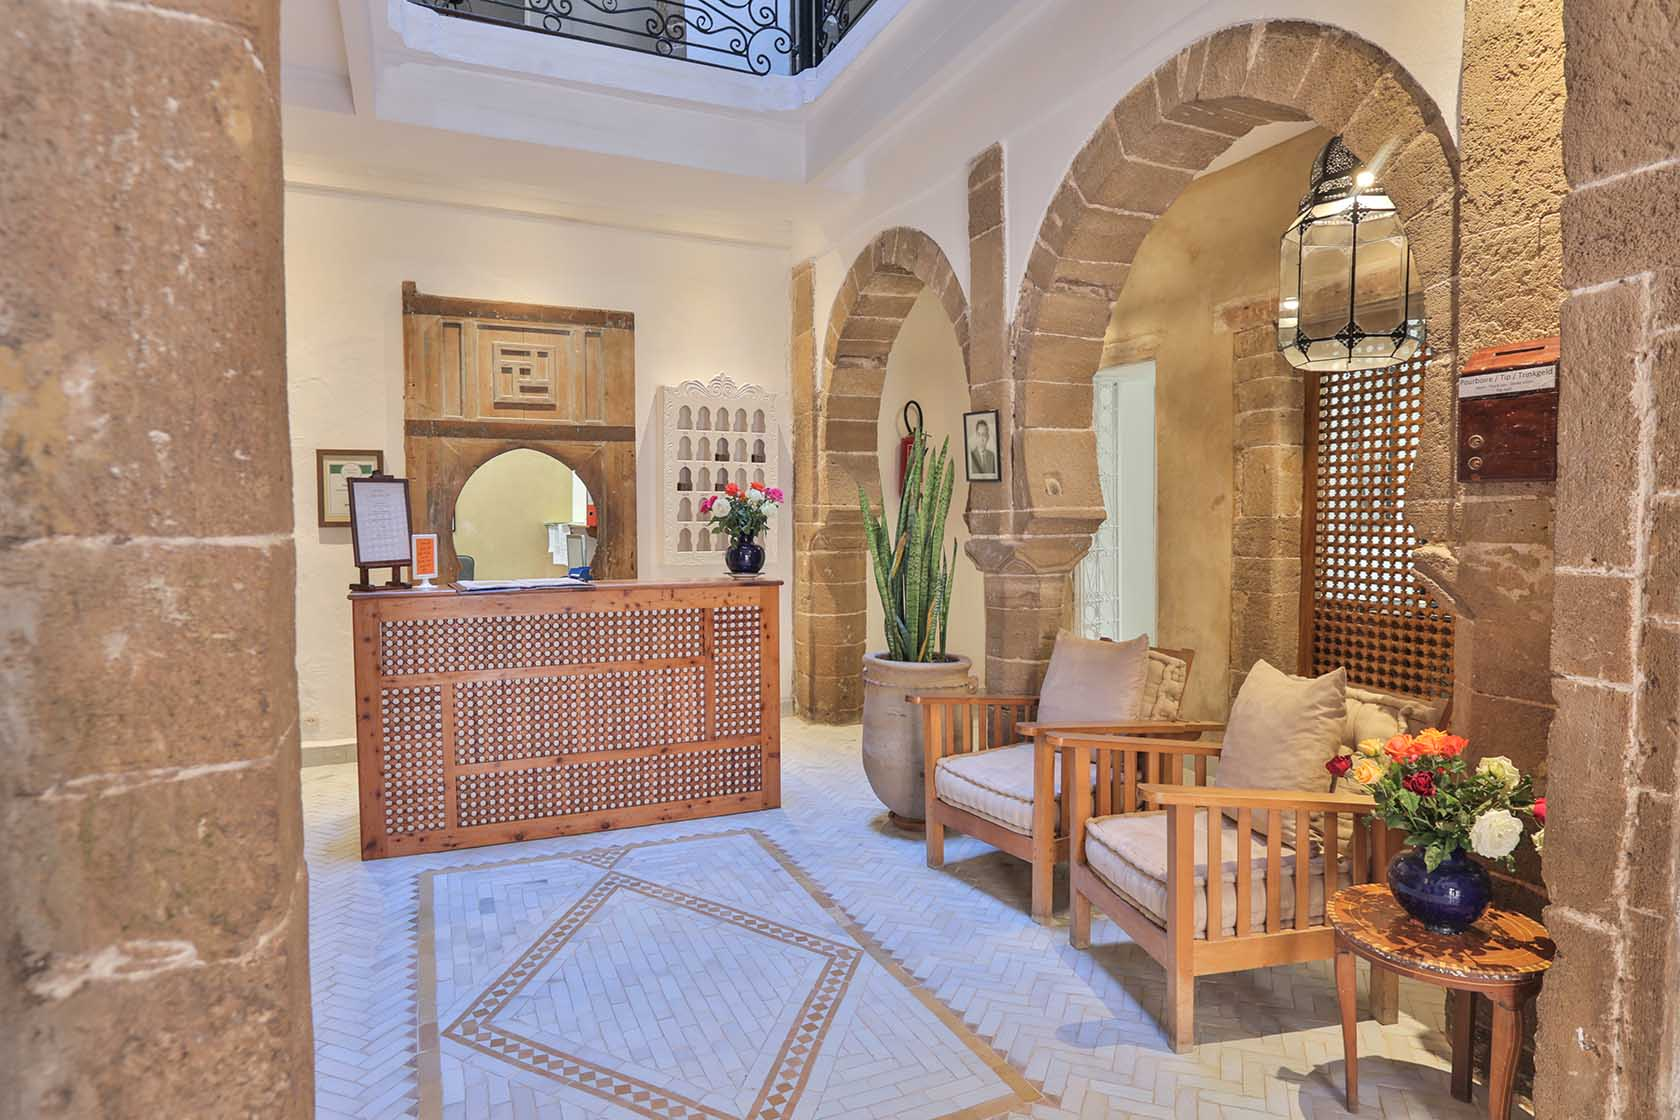 Maison d hotes villa maroc essaouira - Les jardins de villa maroc essaouira ...